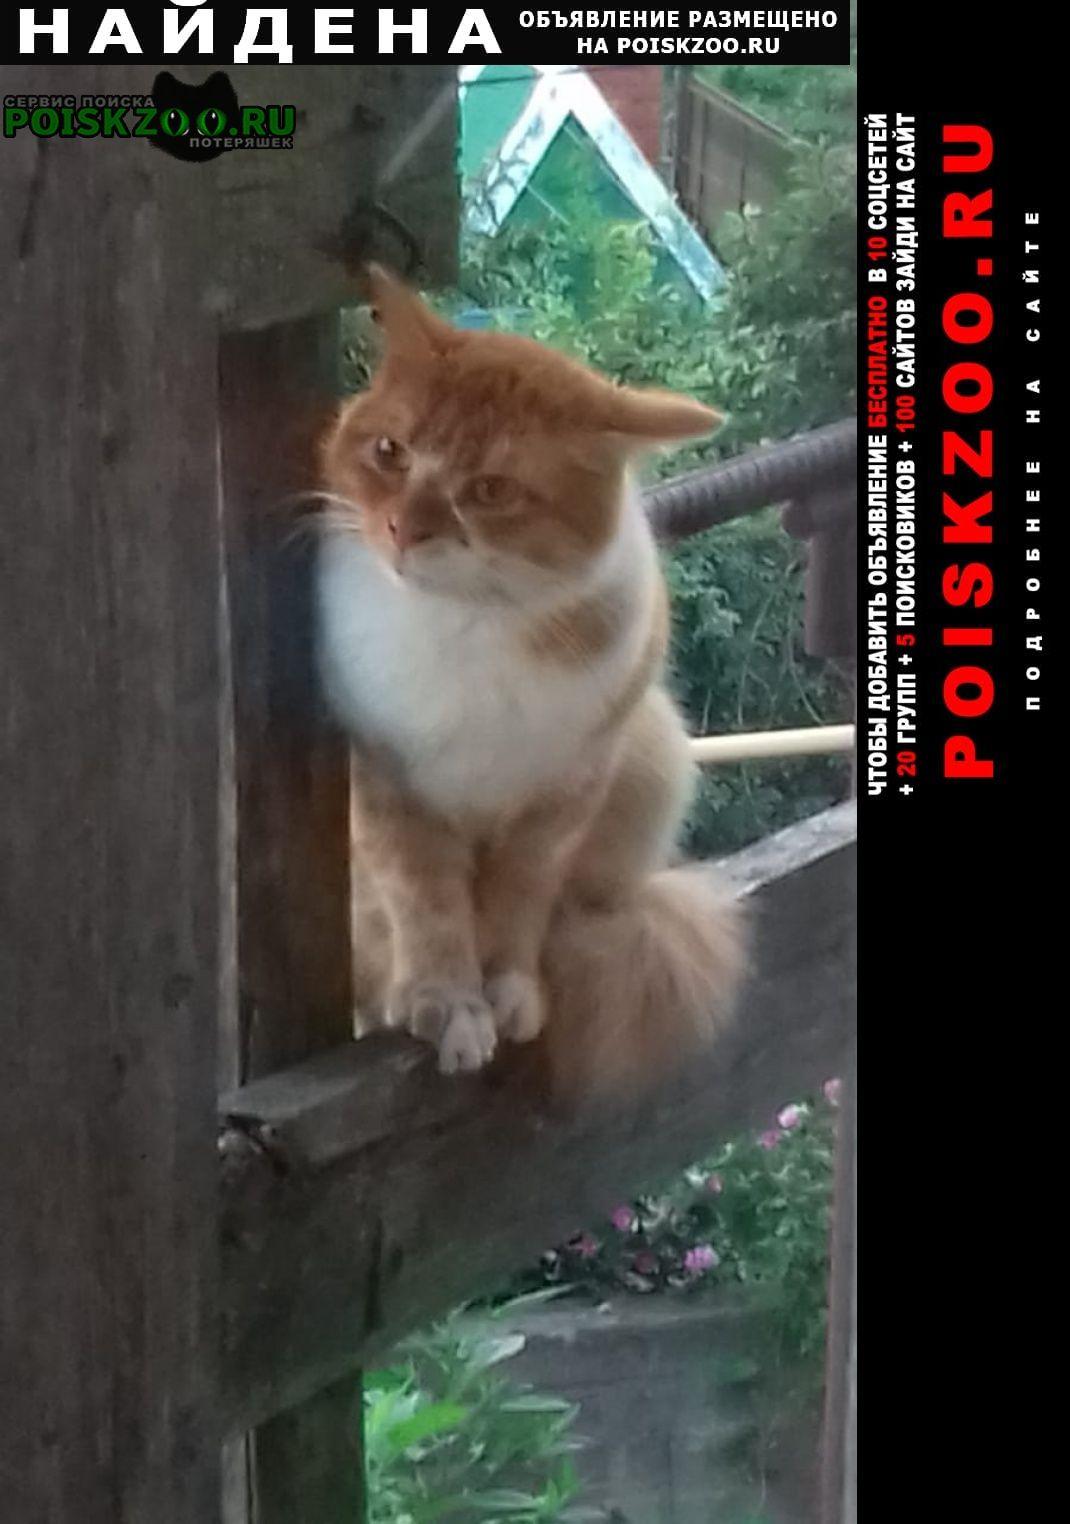 Найдена кошка Сочи